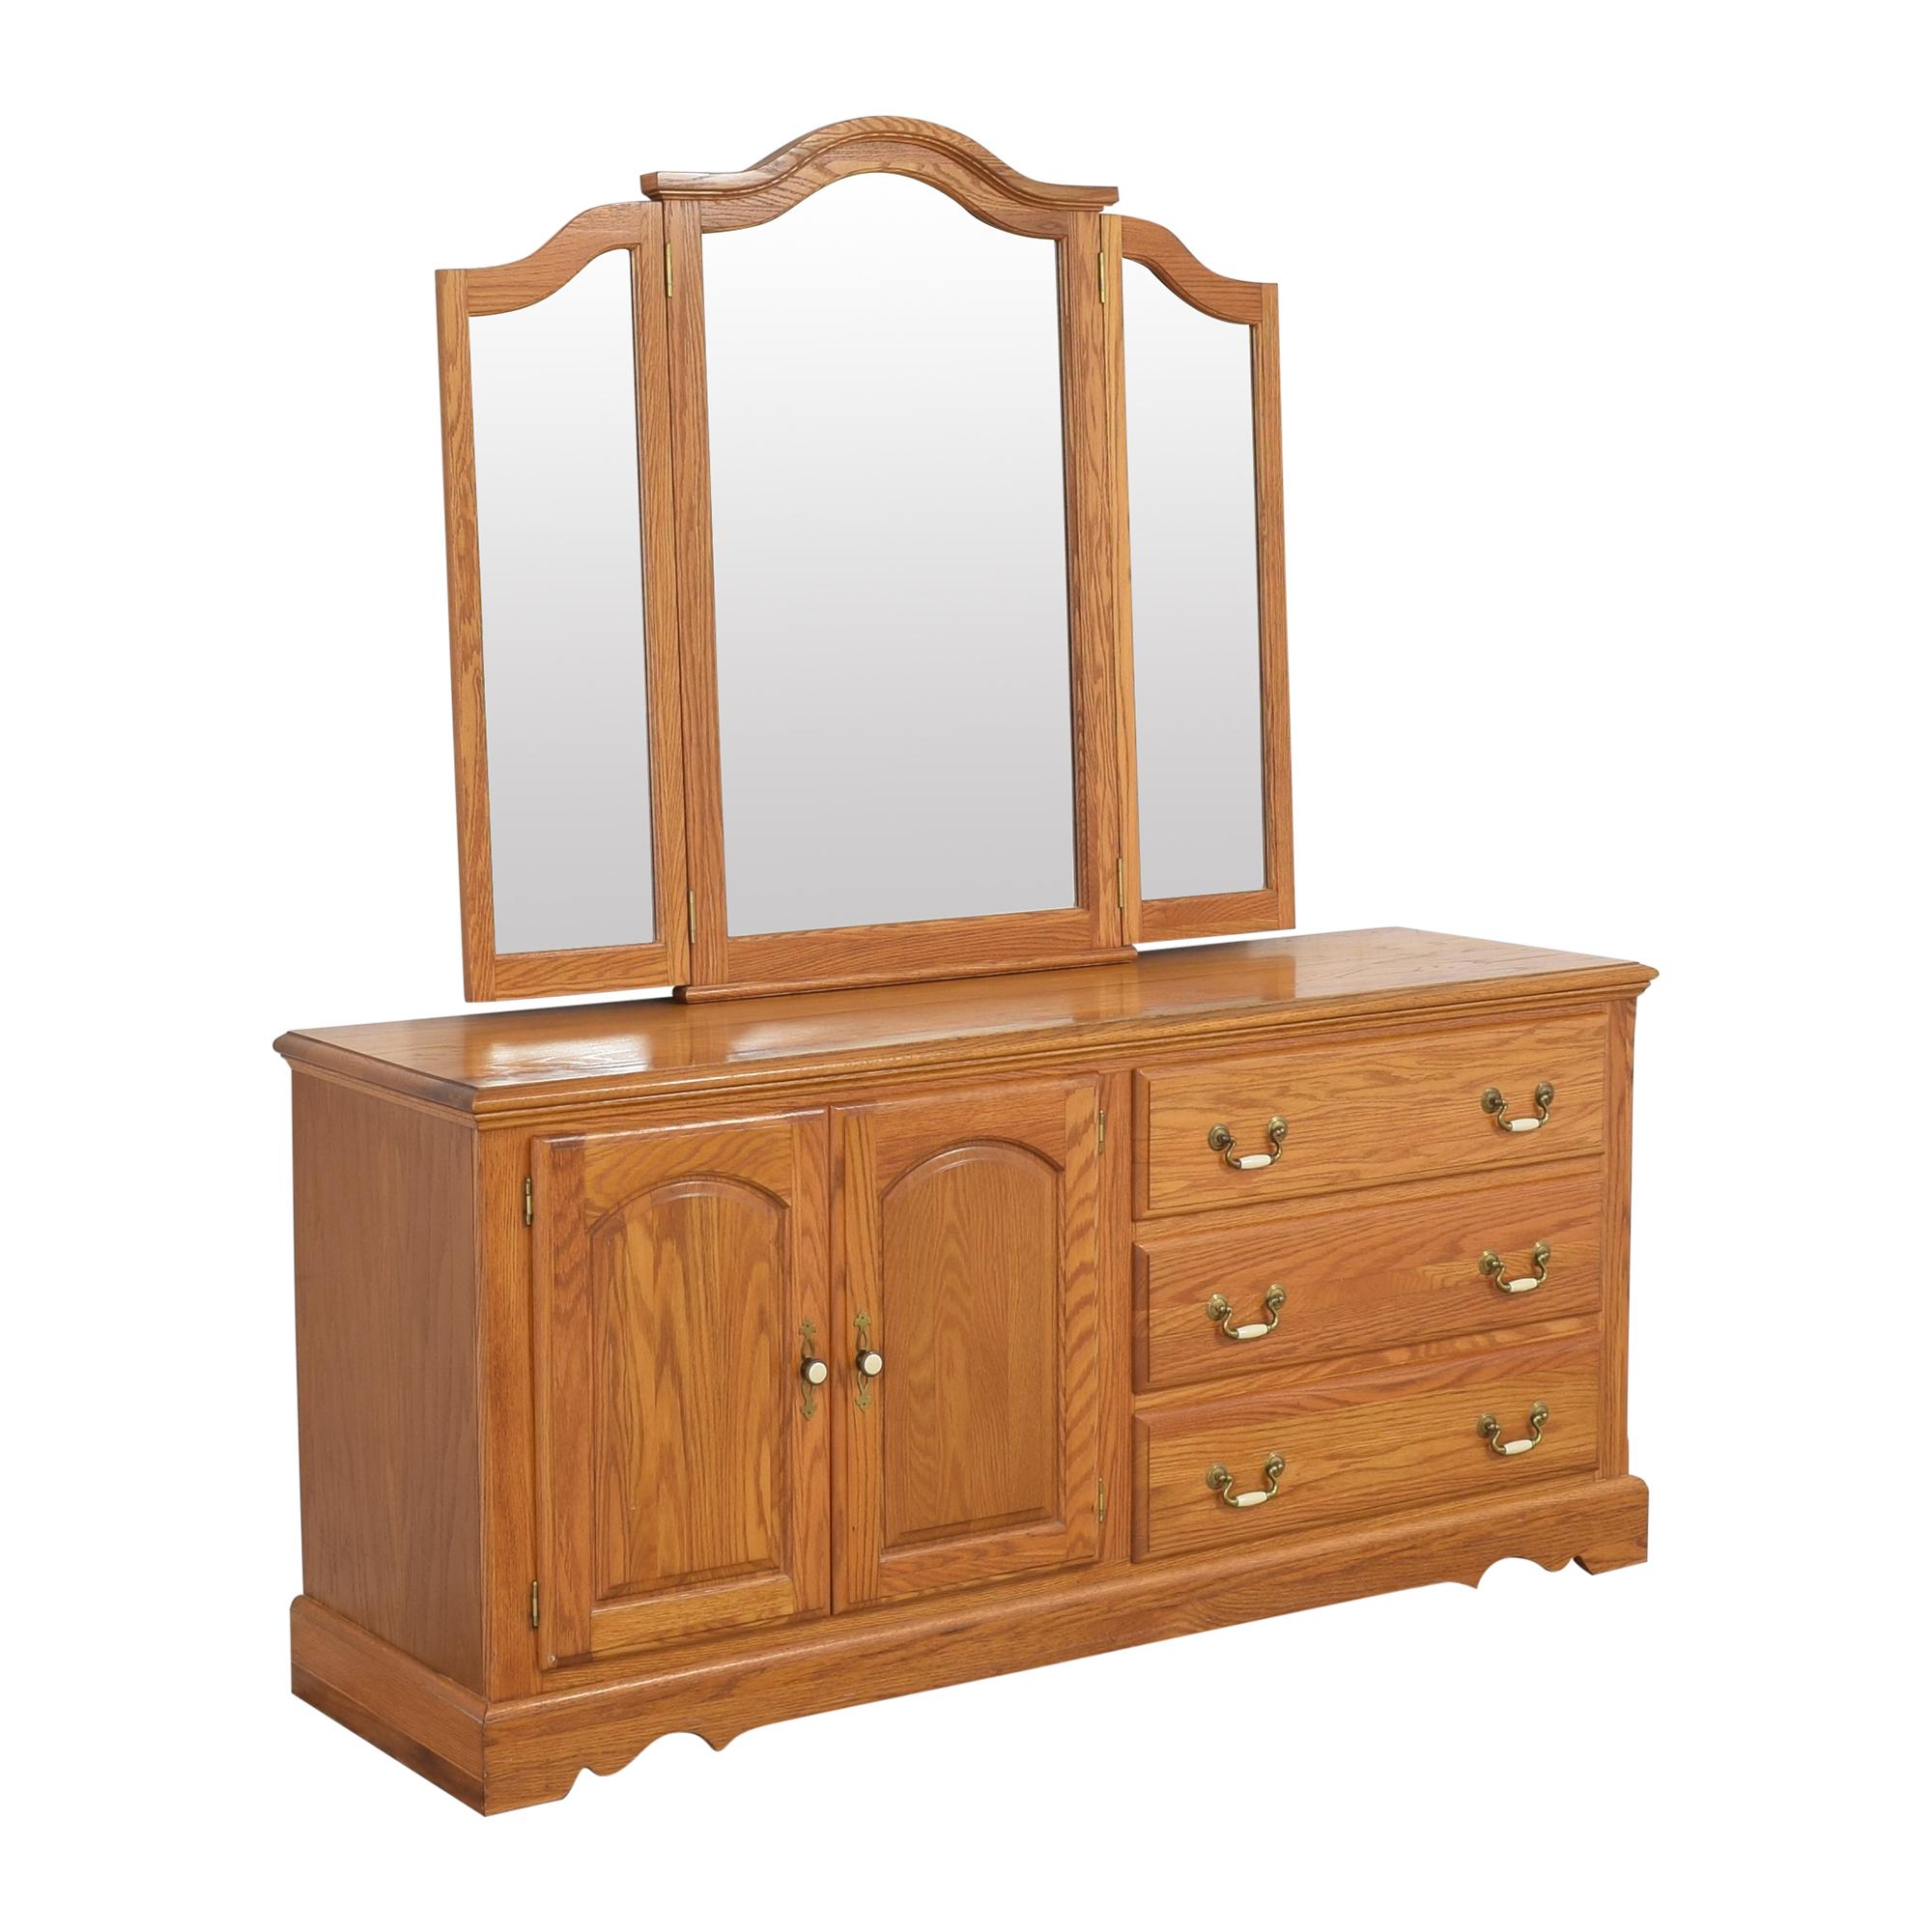 shop Nathan Hale Door Dresser and Triple Mirror Nathan Hale Dressers